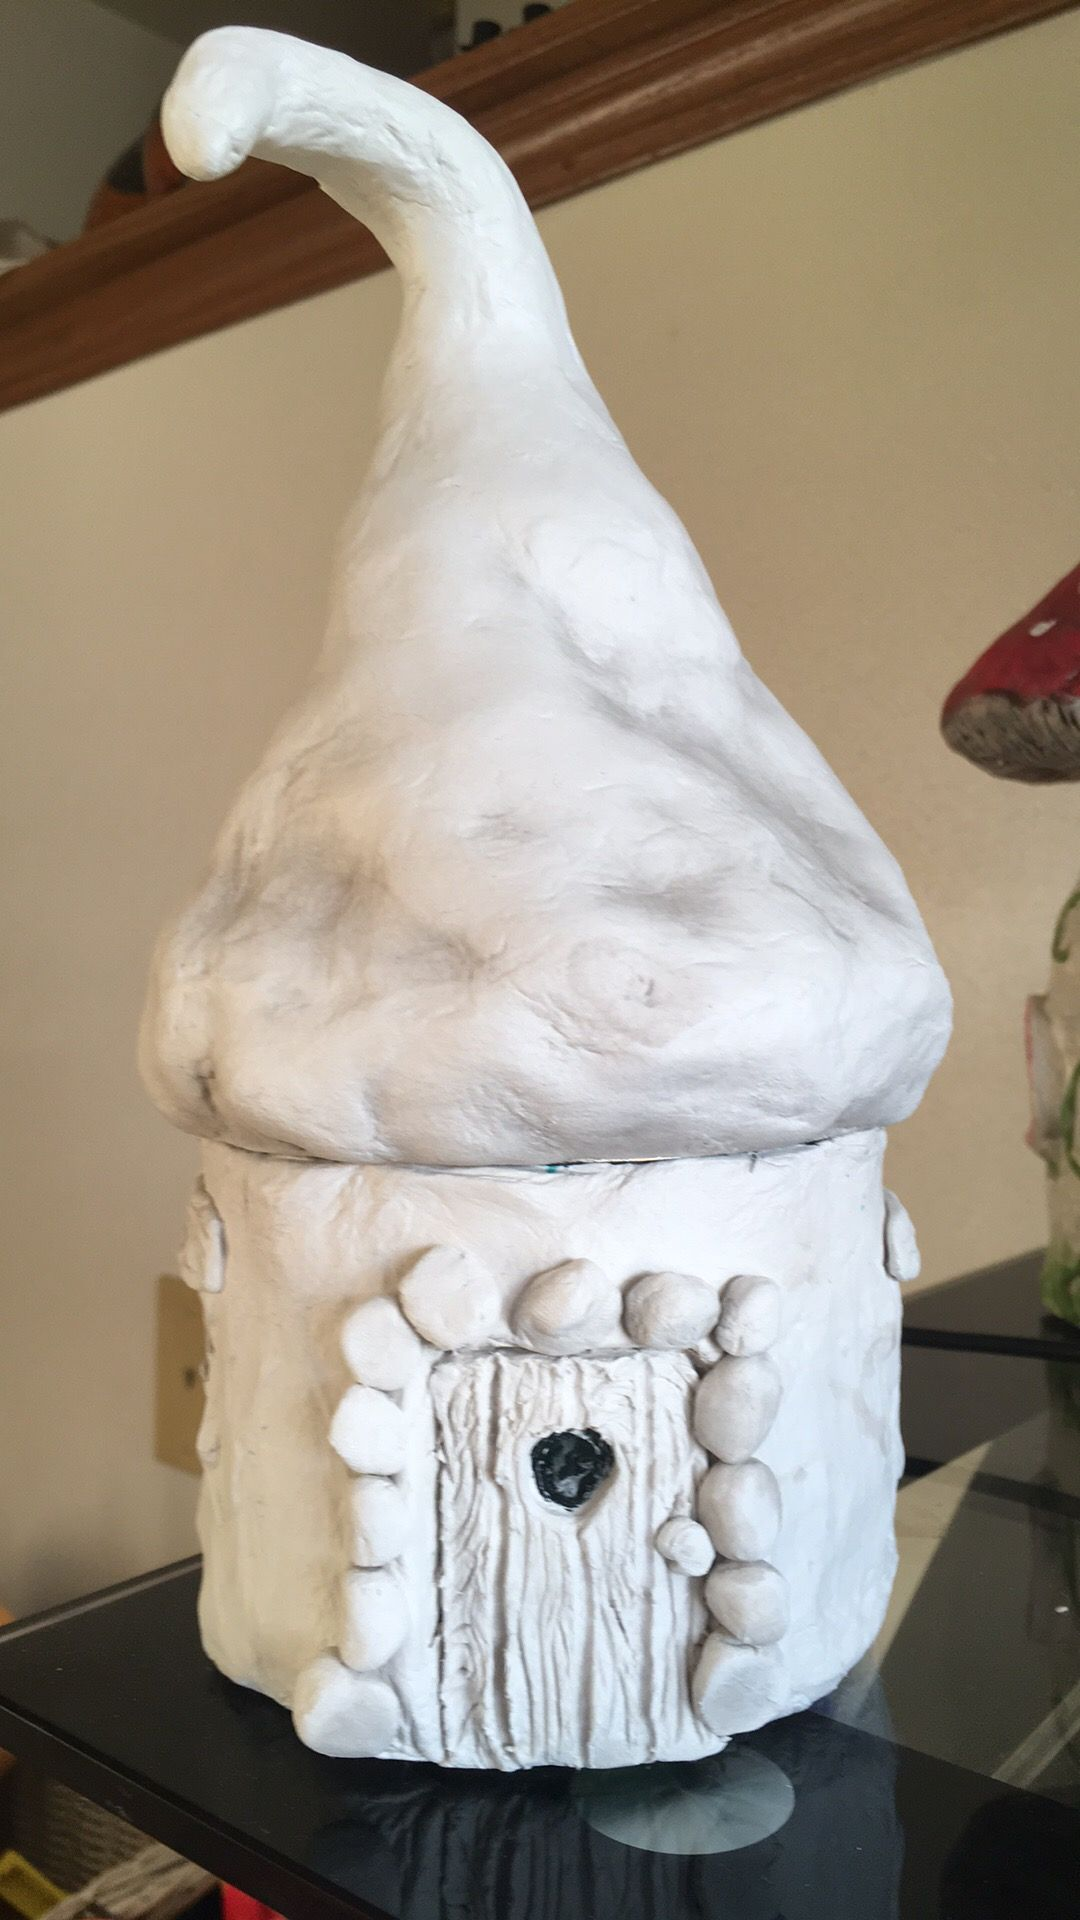 Air dry clay mushroom house | PORCELAIN | Pinterest | Mushroom ...